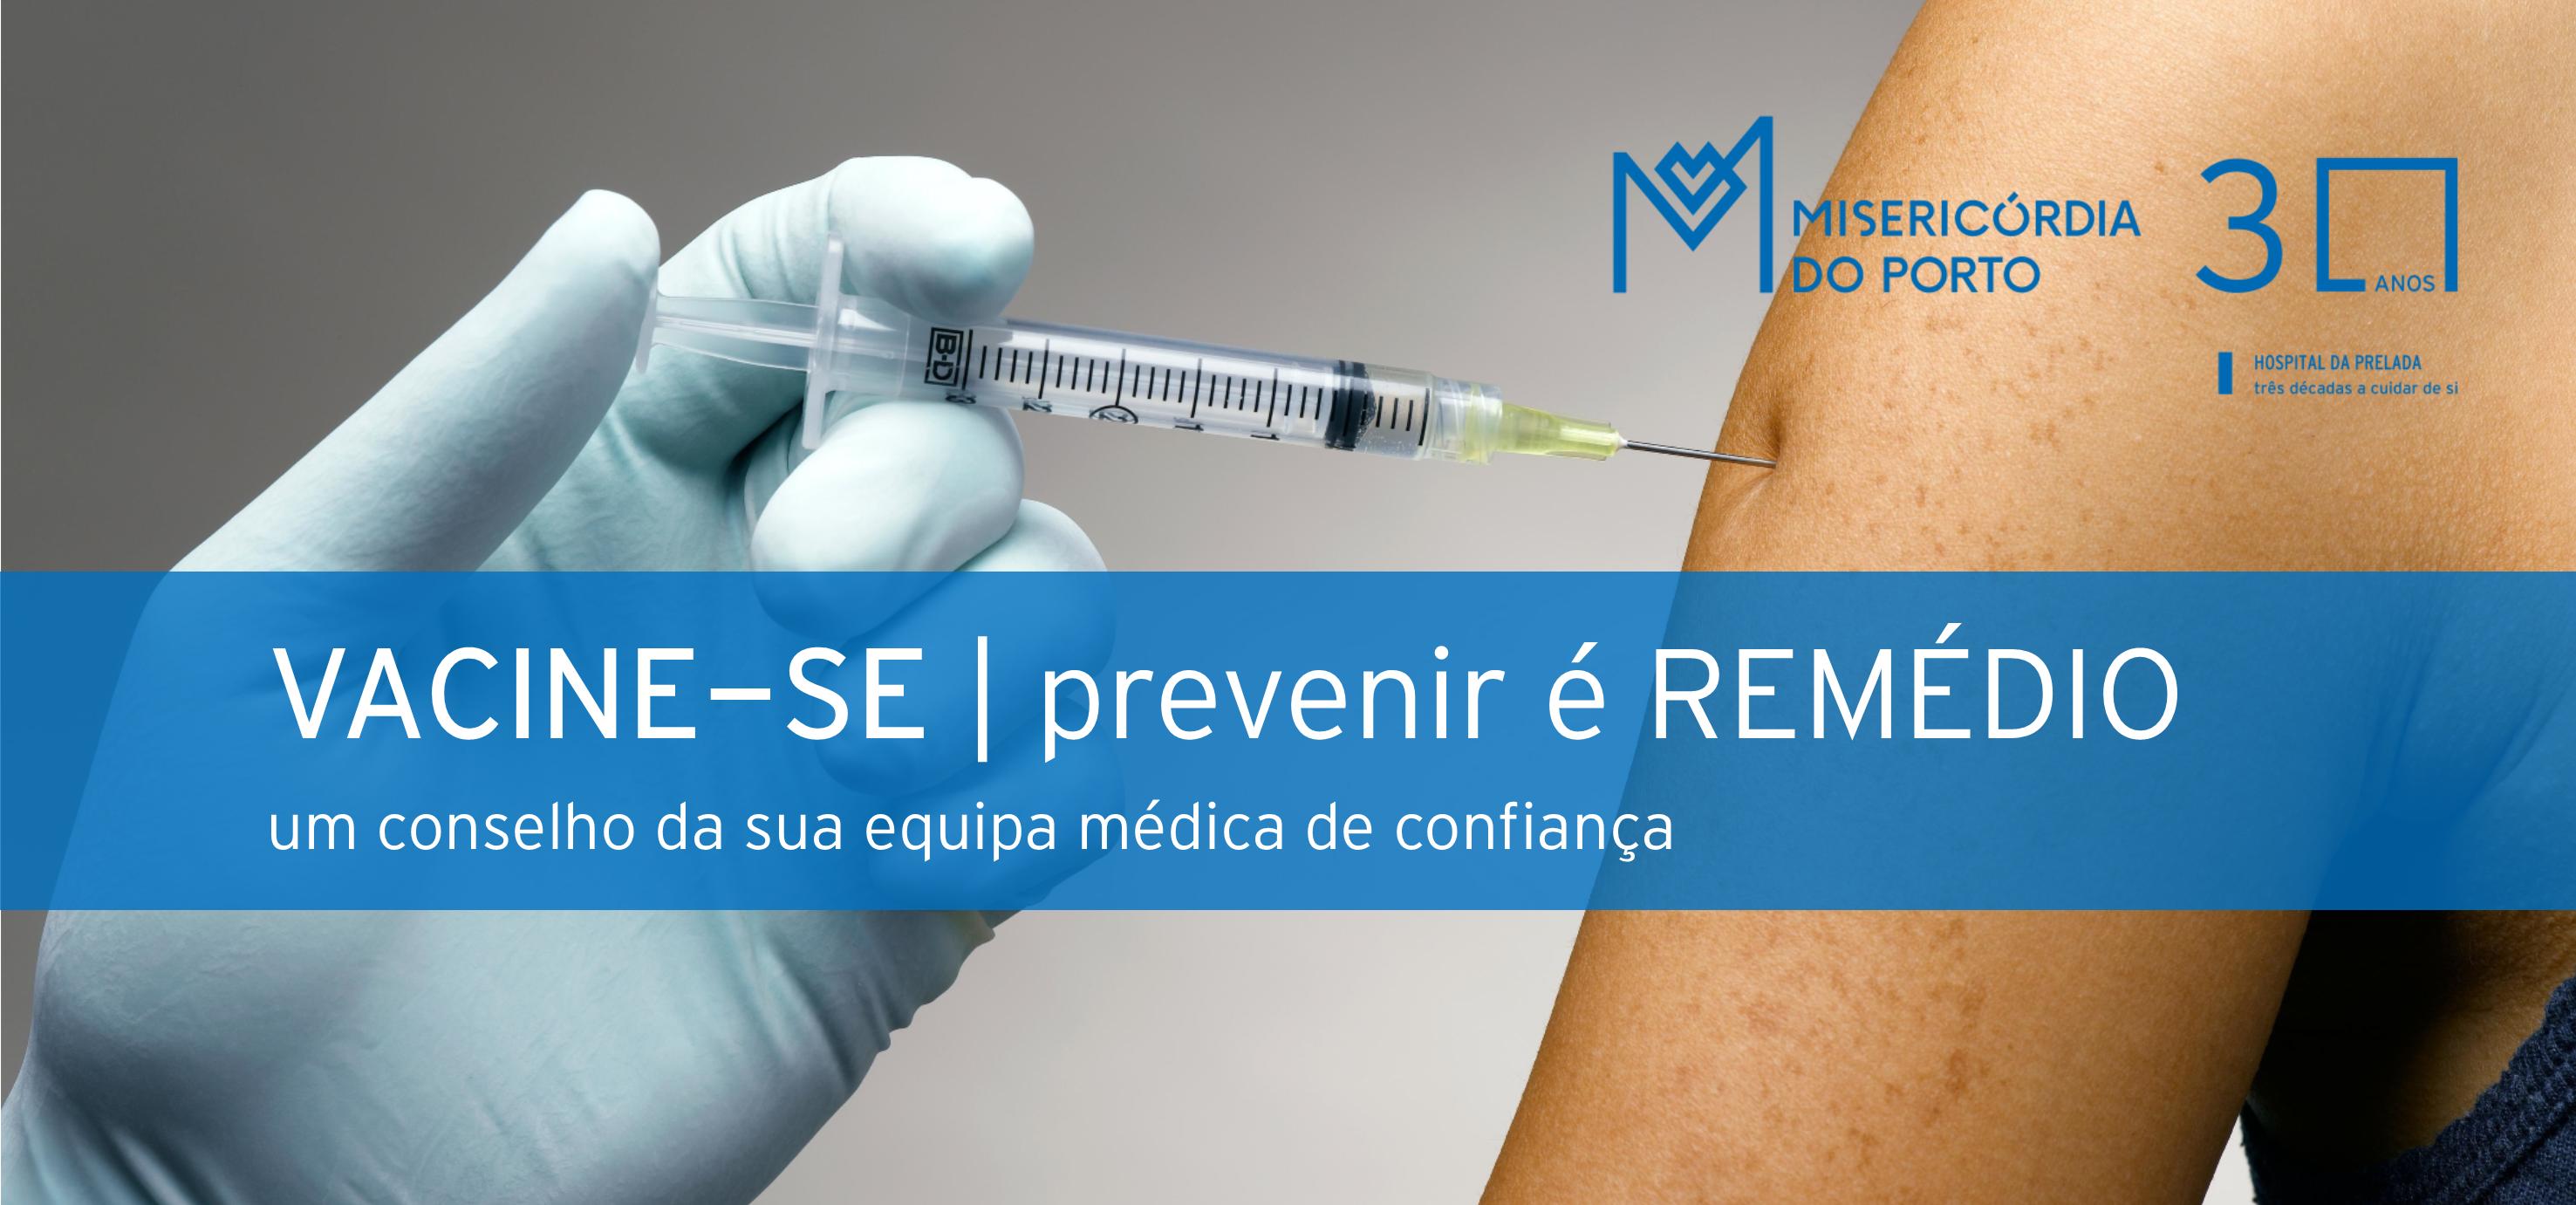 https://www.scmp.pt/assets/misc/img/noticias/2018/2018%2001%2005%20HP%20Gripe/vacina%20gripe.png